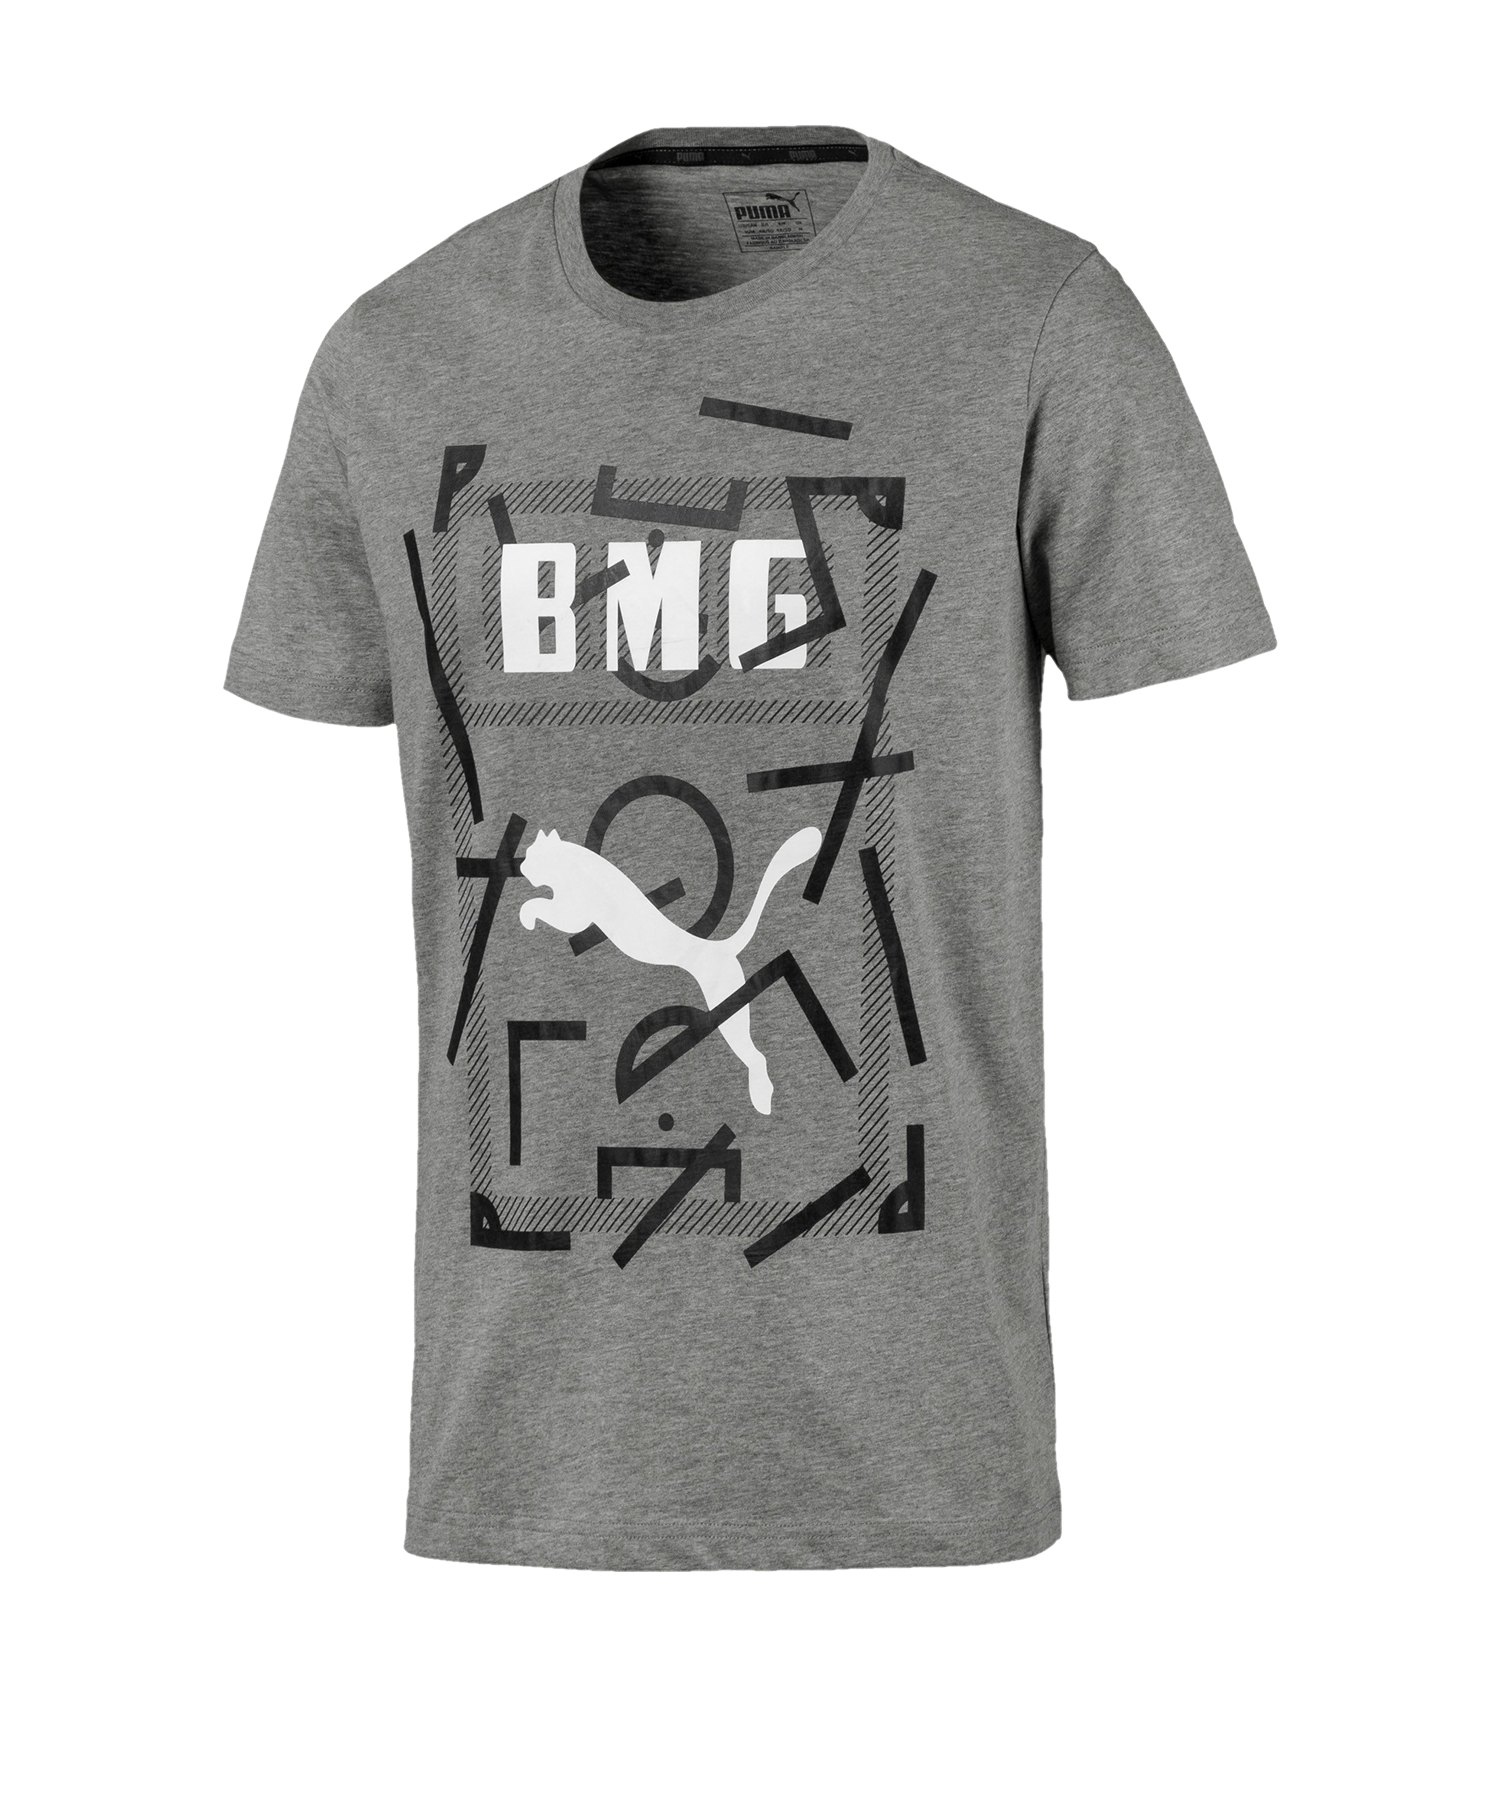 PUMA Borussia Mönchengladbach DNA T-Shirt Grau F15 - Grau